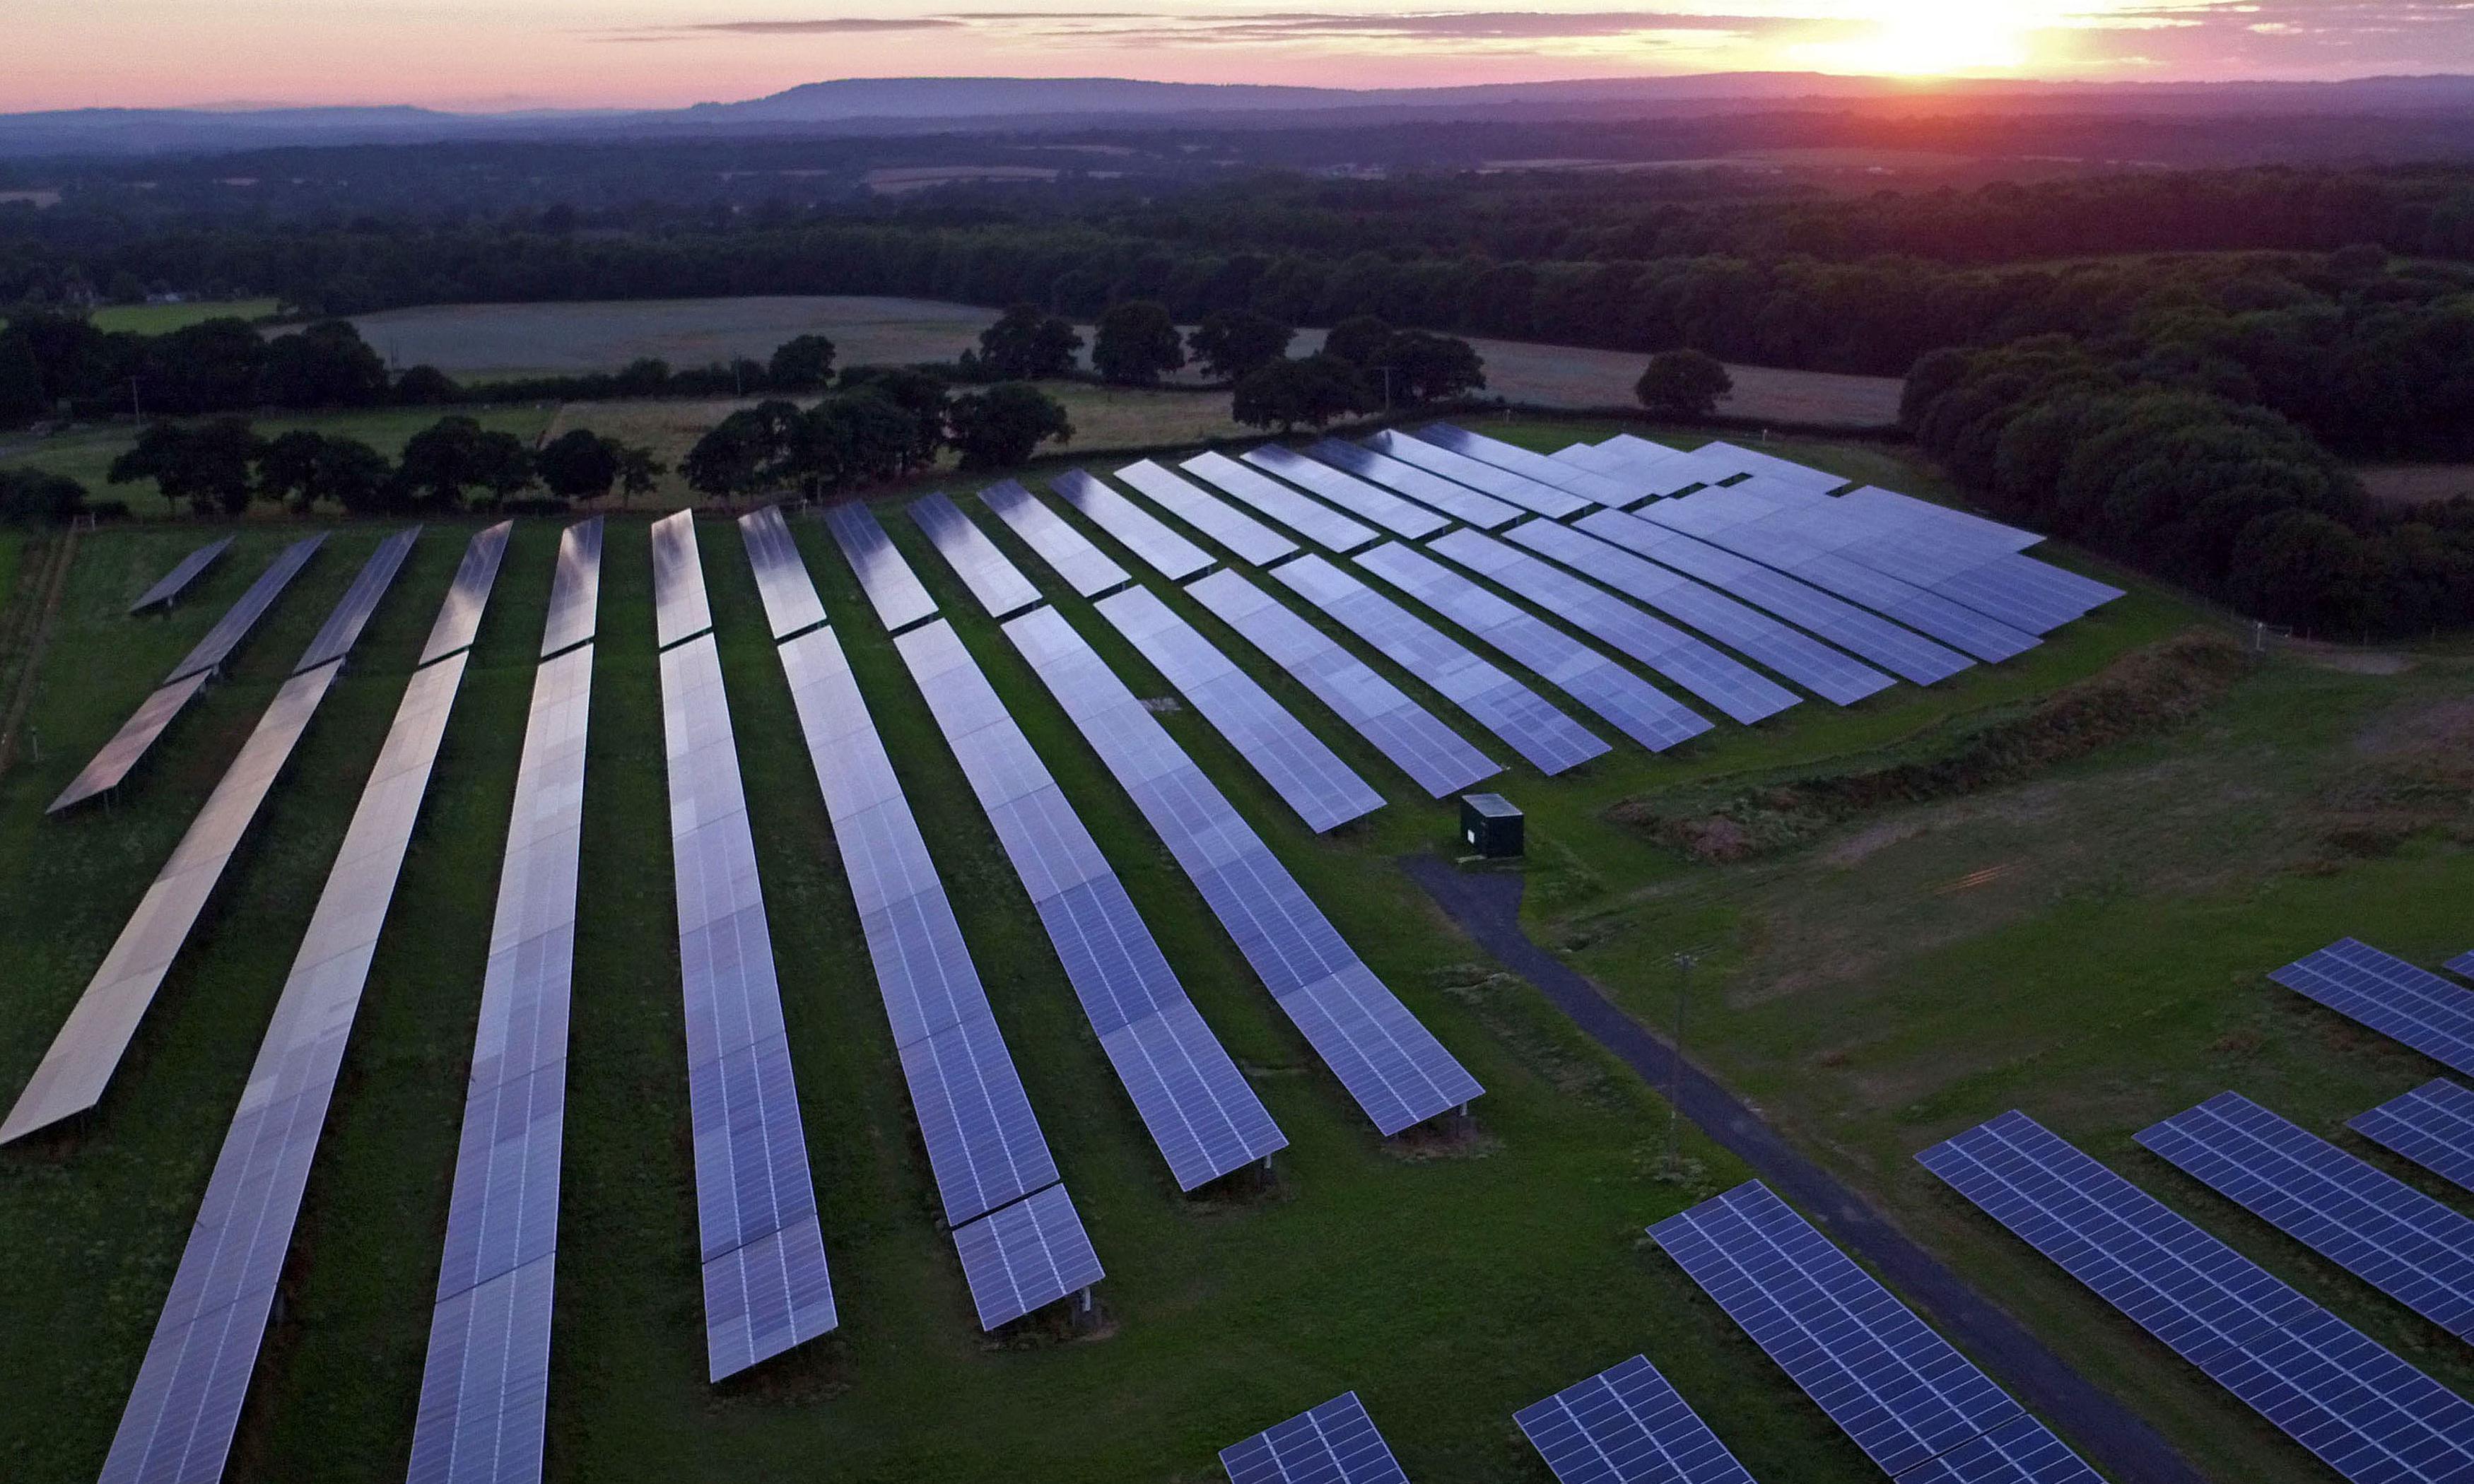 New renewable energy capacity hit record levels in 2019